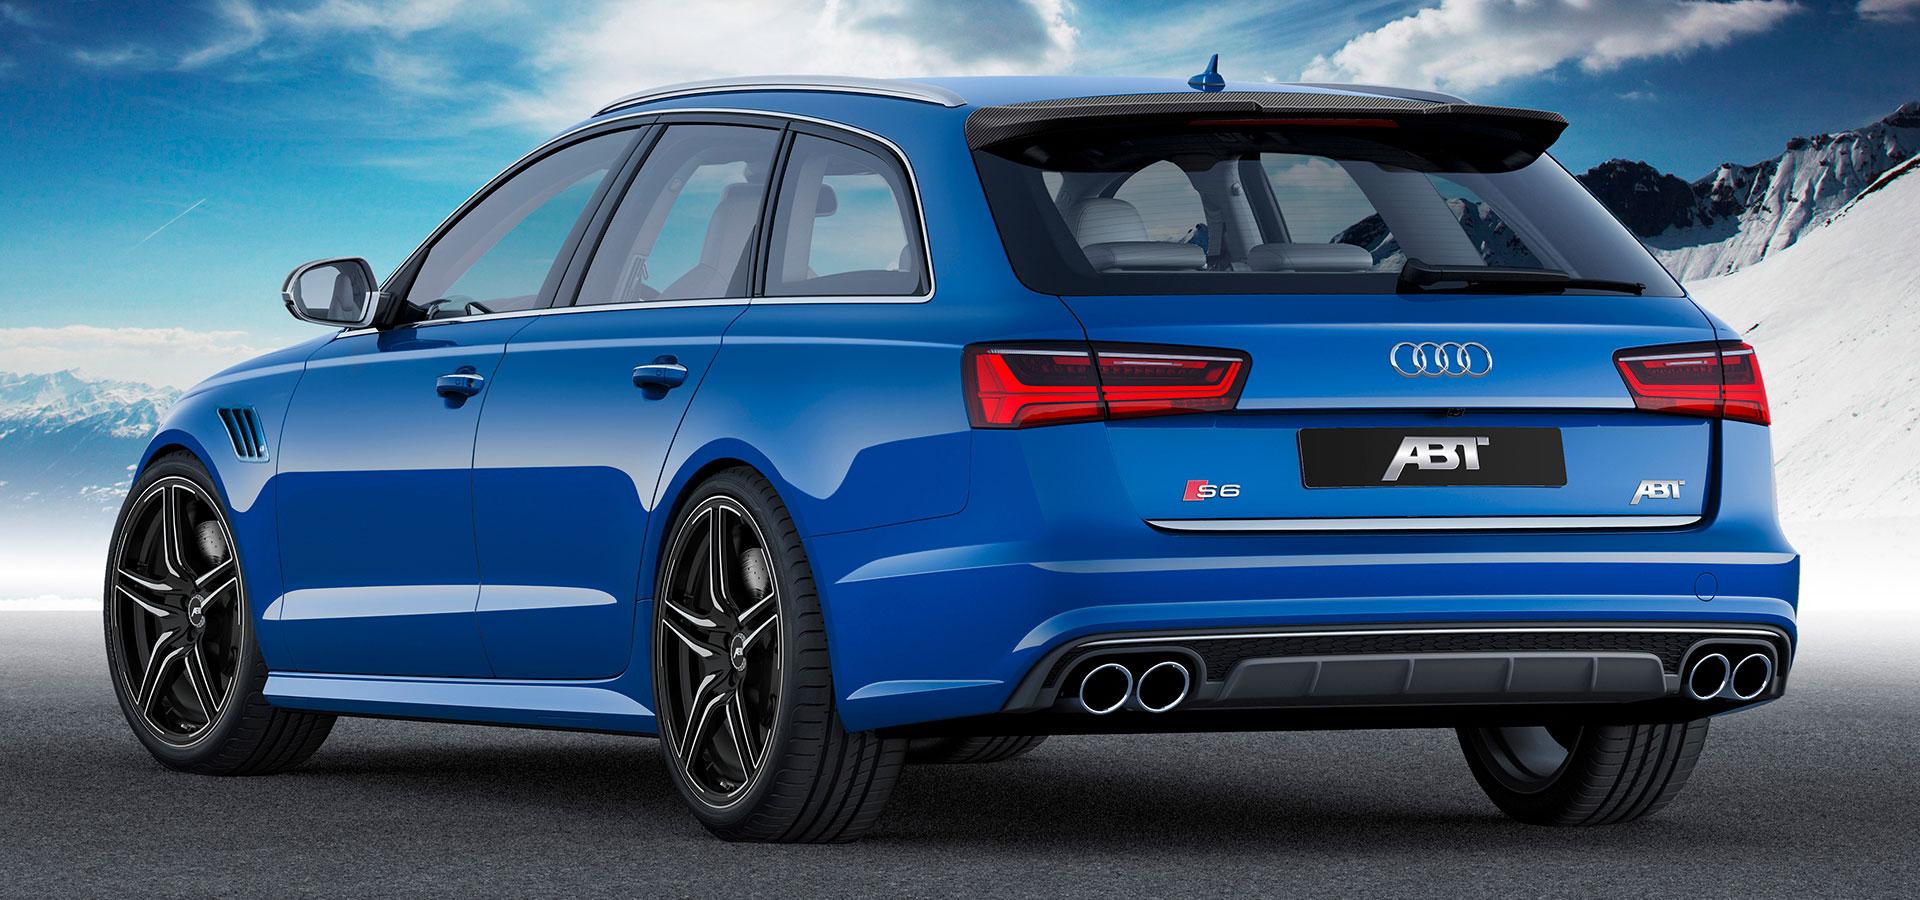 Kelebihan Kekurangan Audi S6 2016 Murah Berkualitas